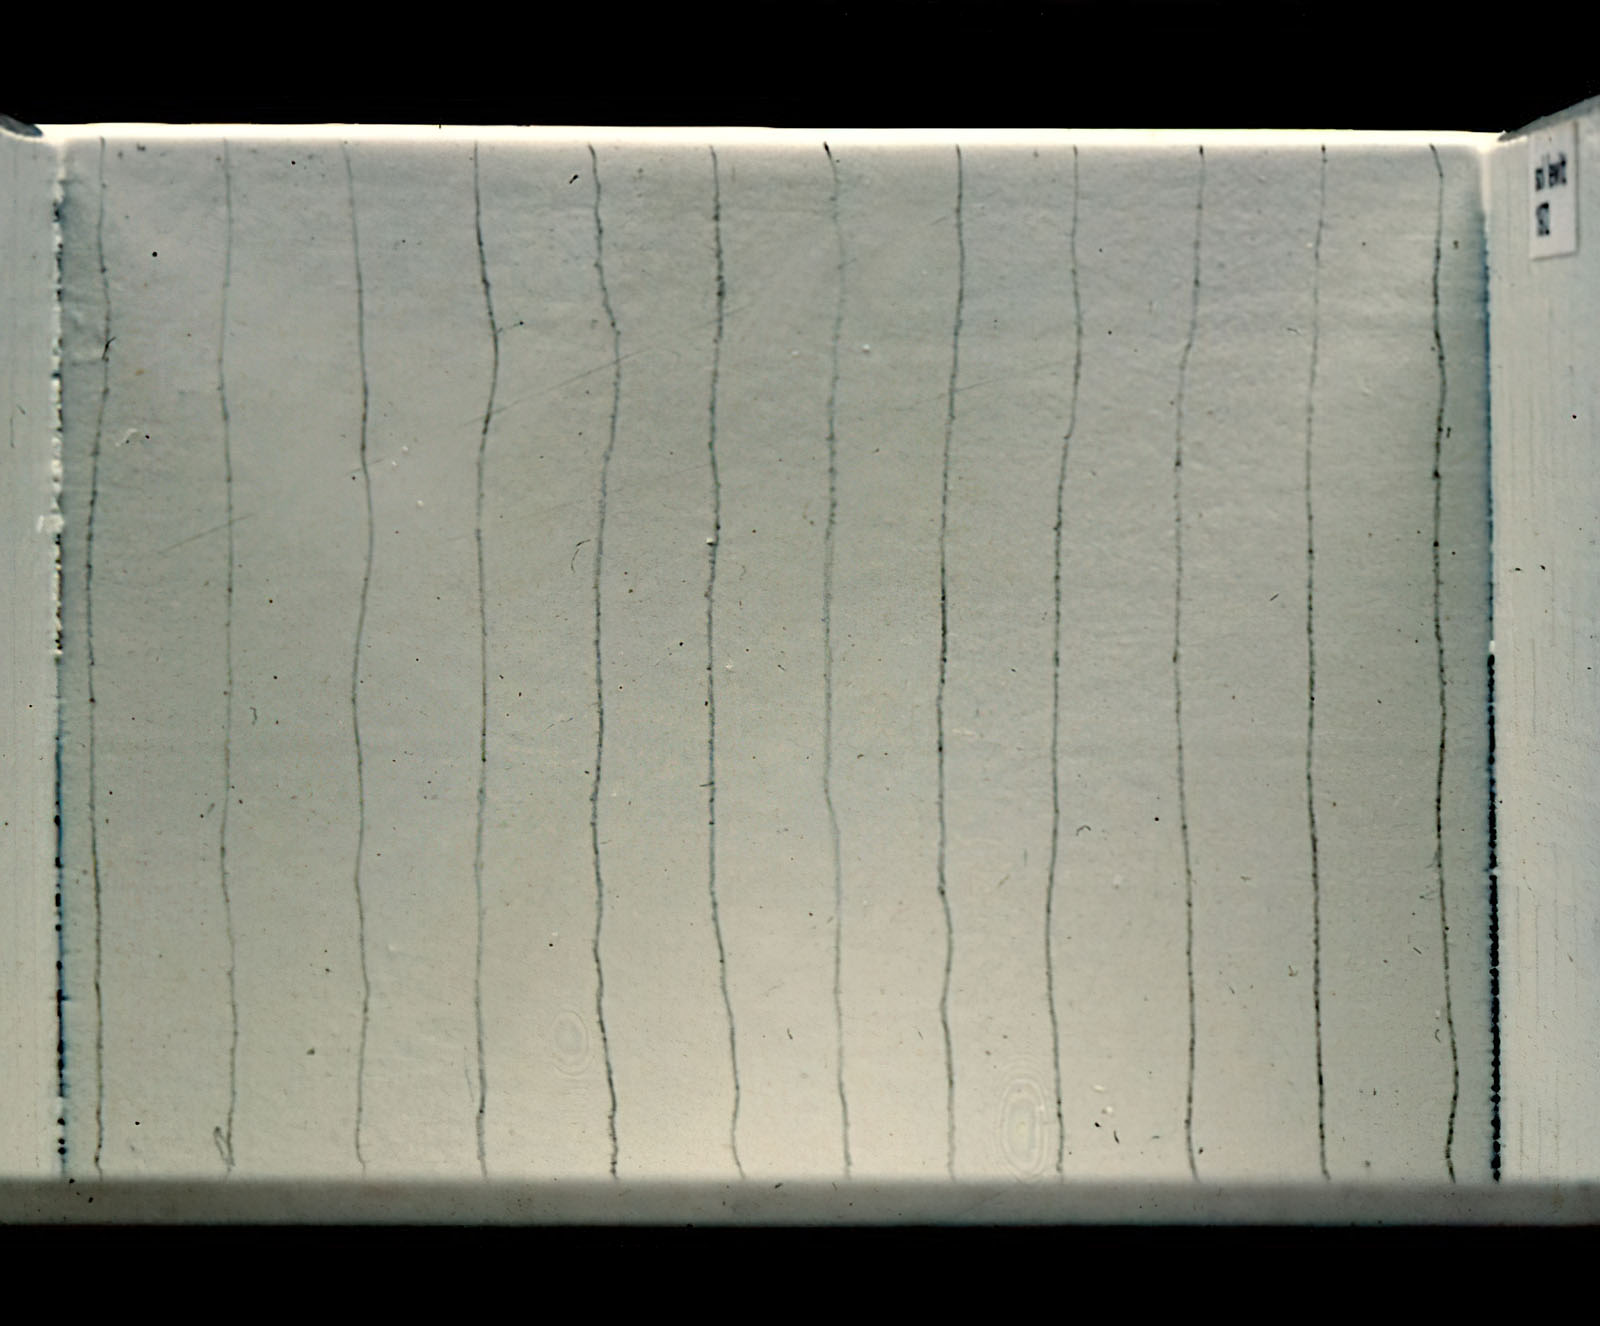 Sol Lewitt - Walldrawing